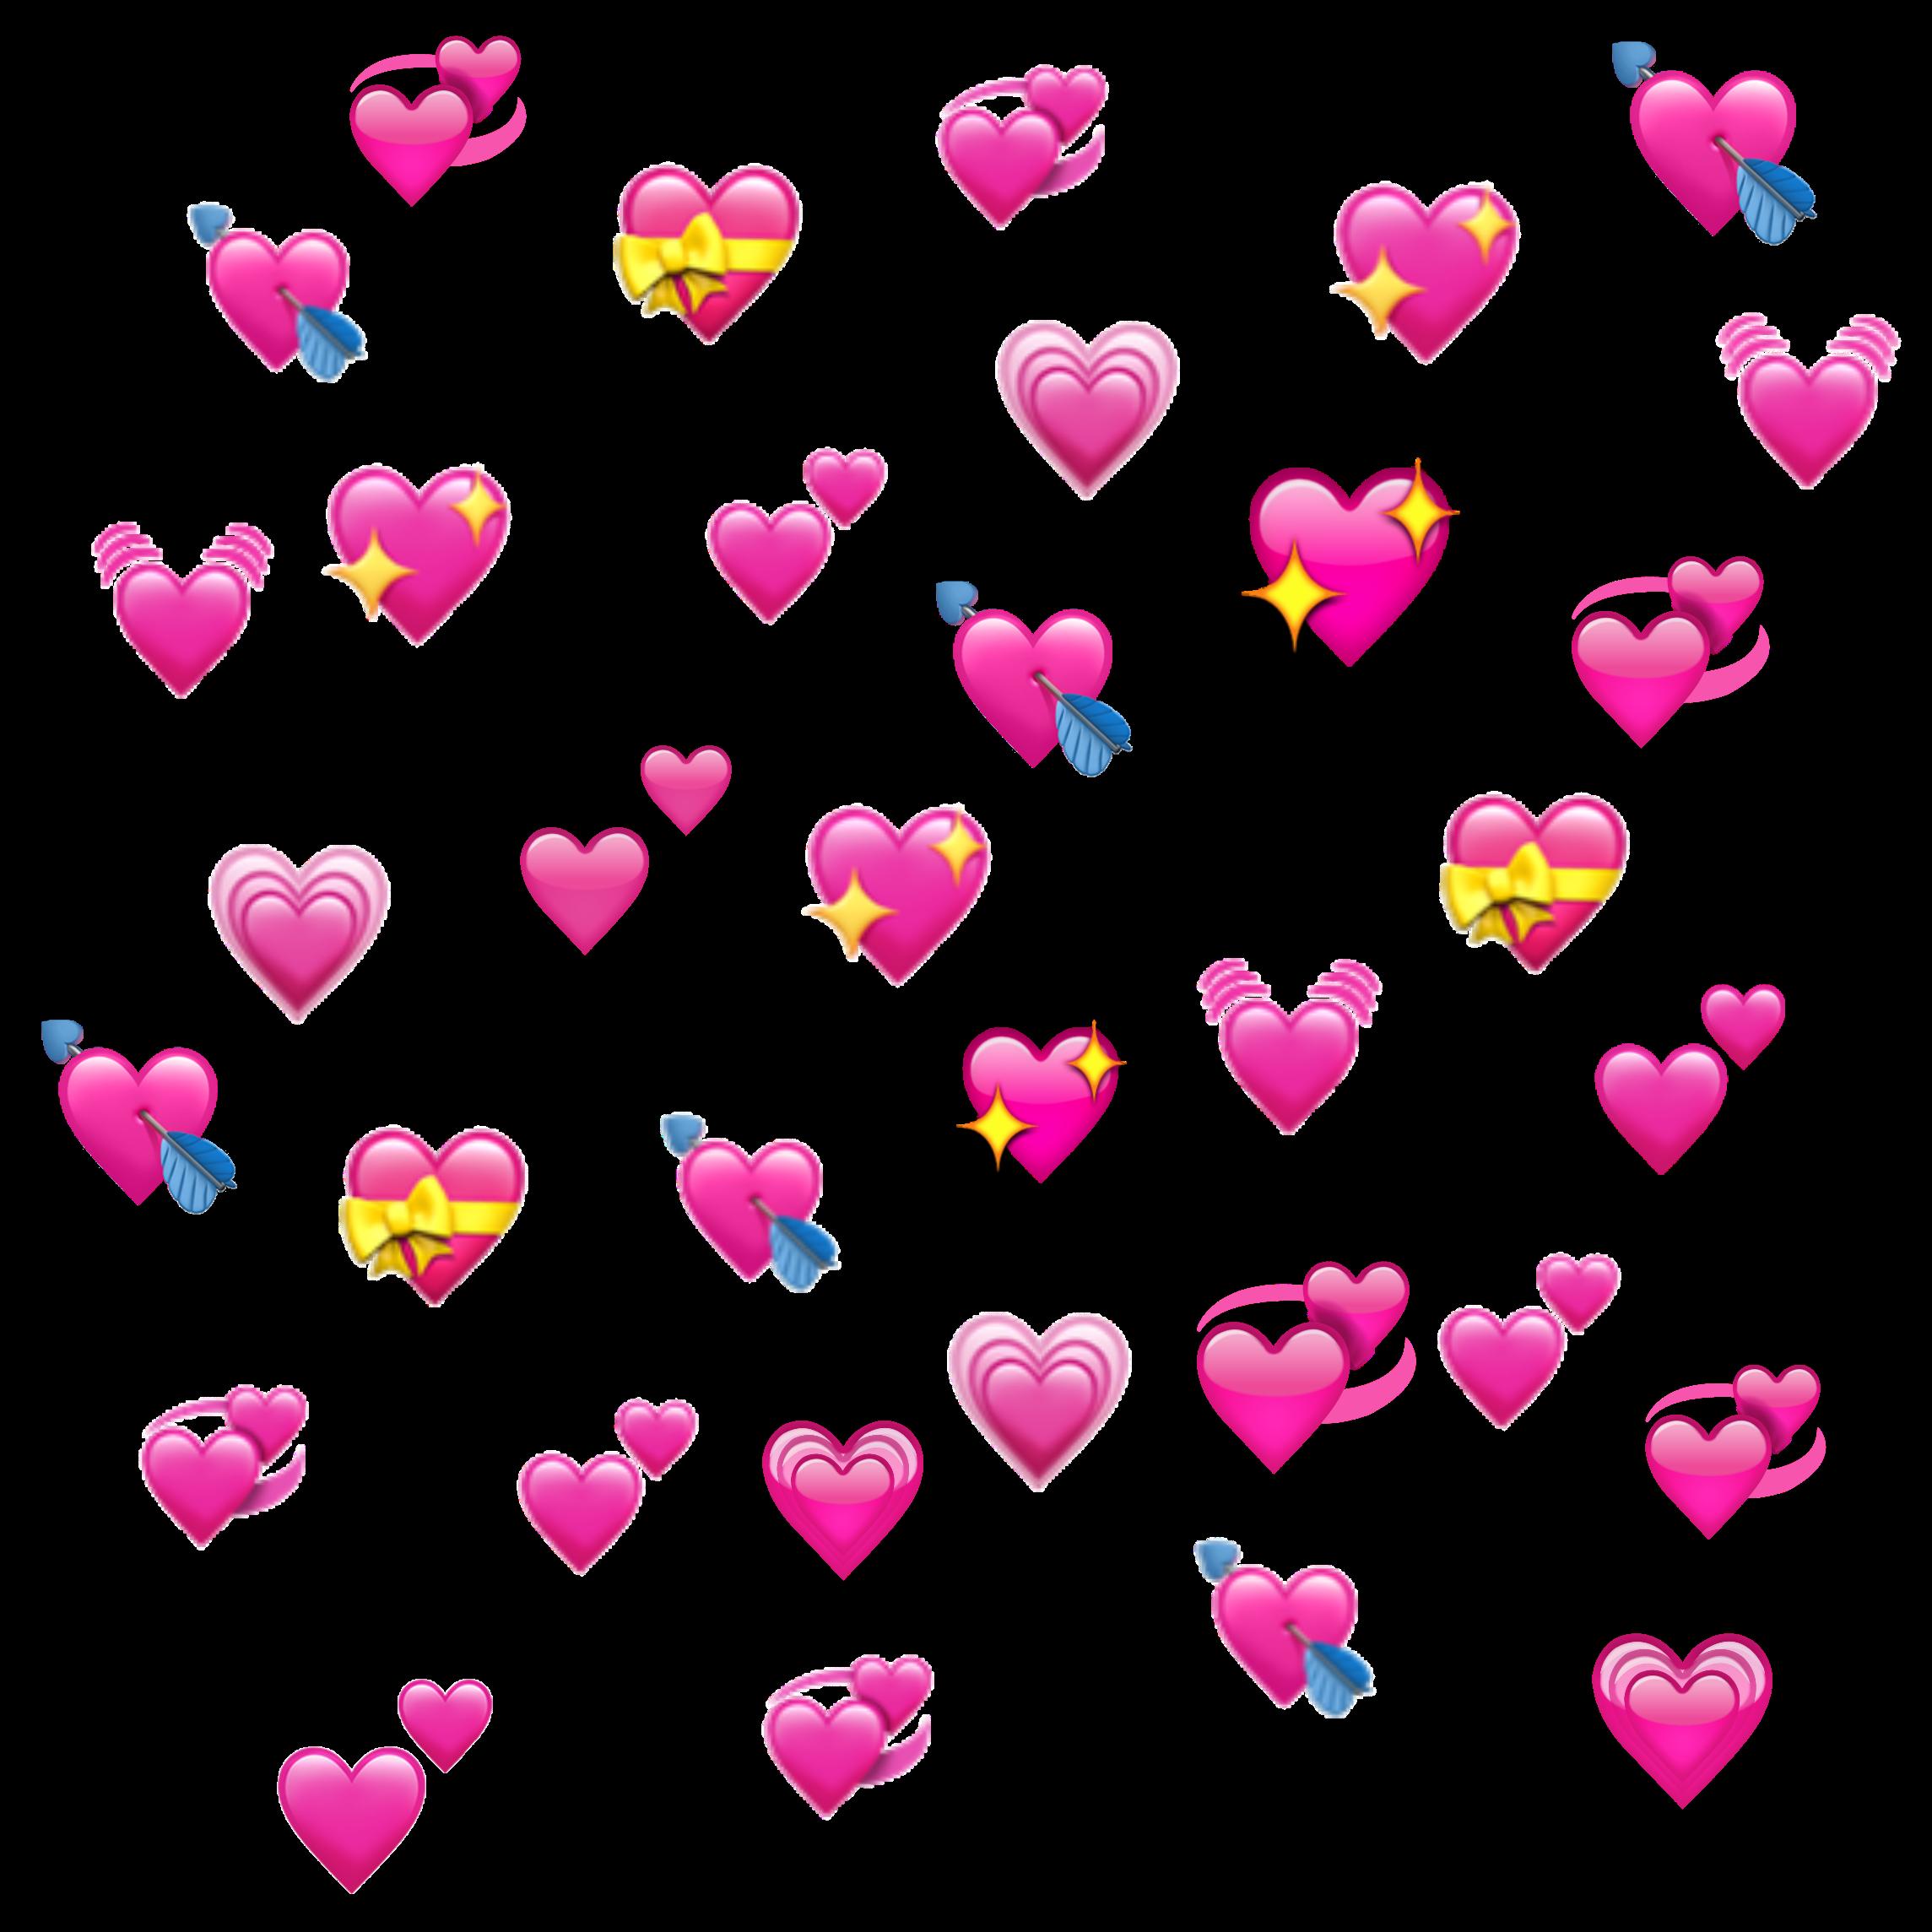 hearts heart emoji emojis heartemoji edit edits... - Heart Emoji Meme